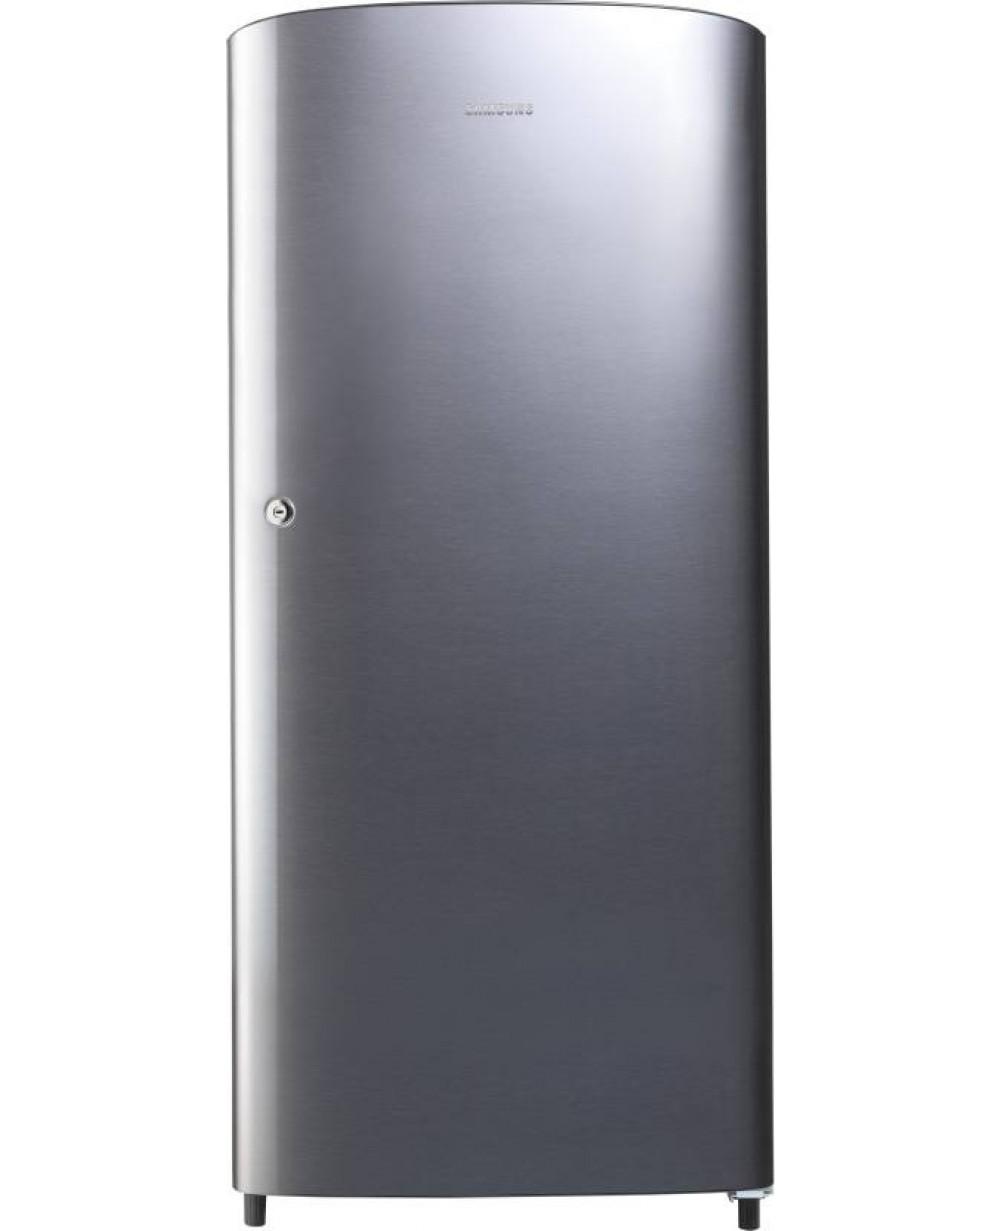 Samsung Refrigerator Without Handle-192Ltr (RR19M2102SE)